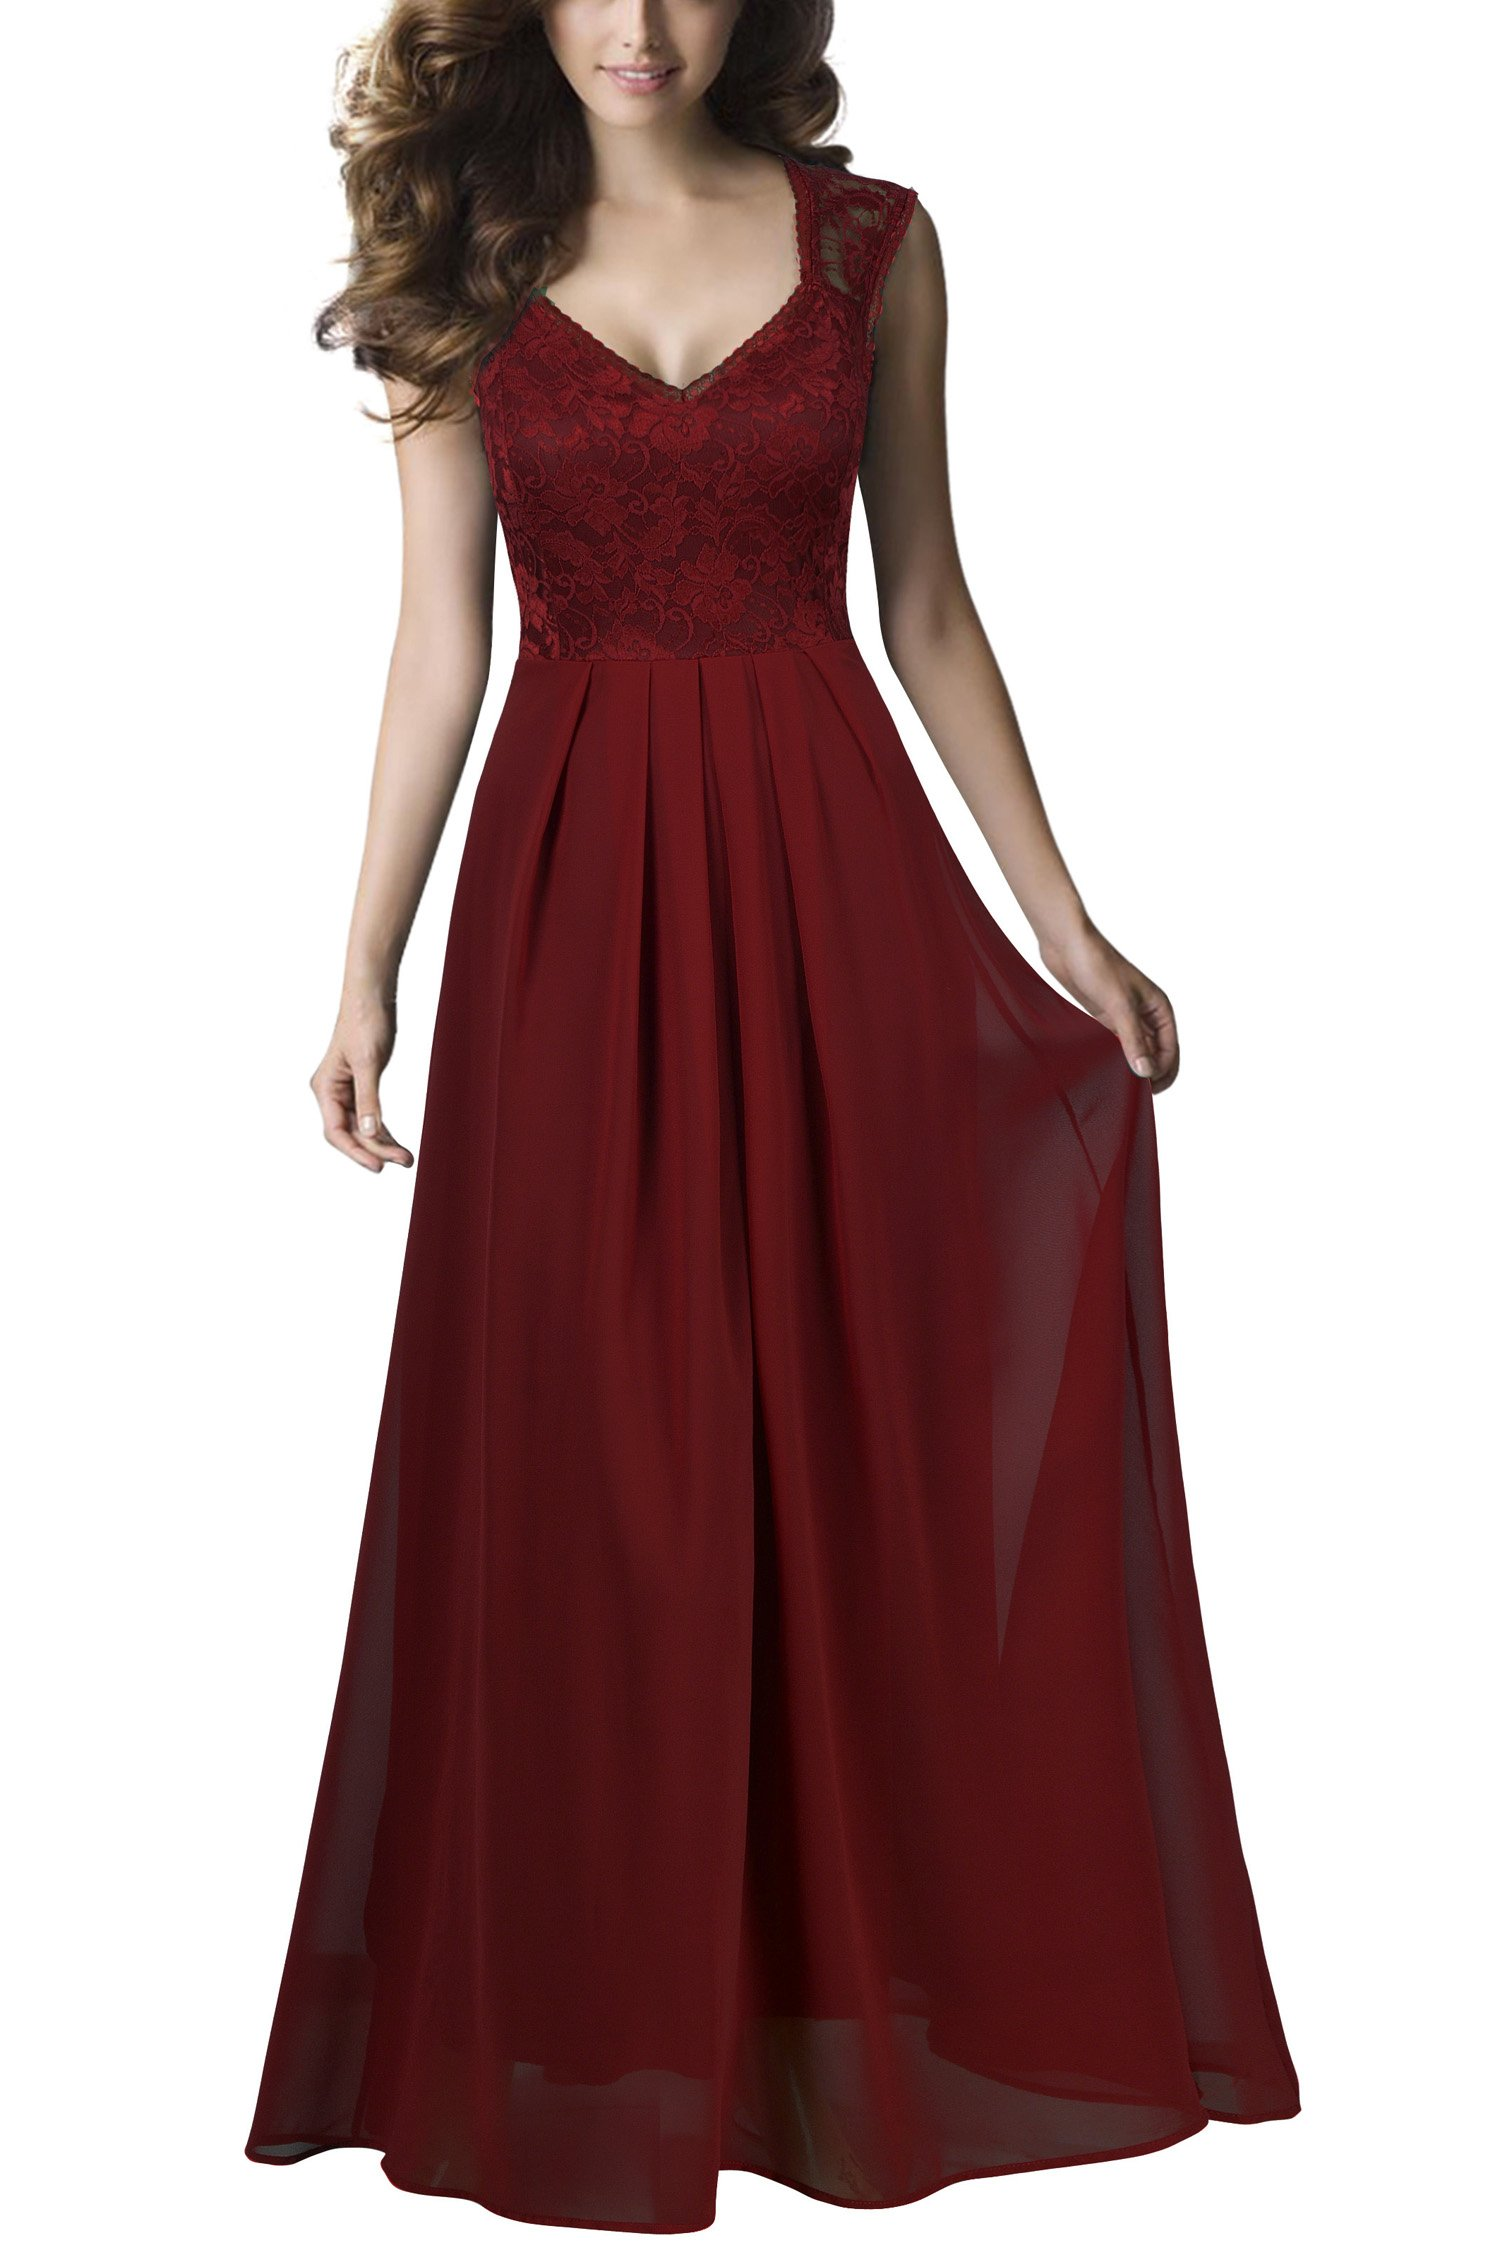 Abendkleider Knielang Rot: Amazon.de